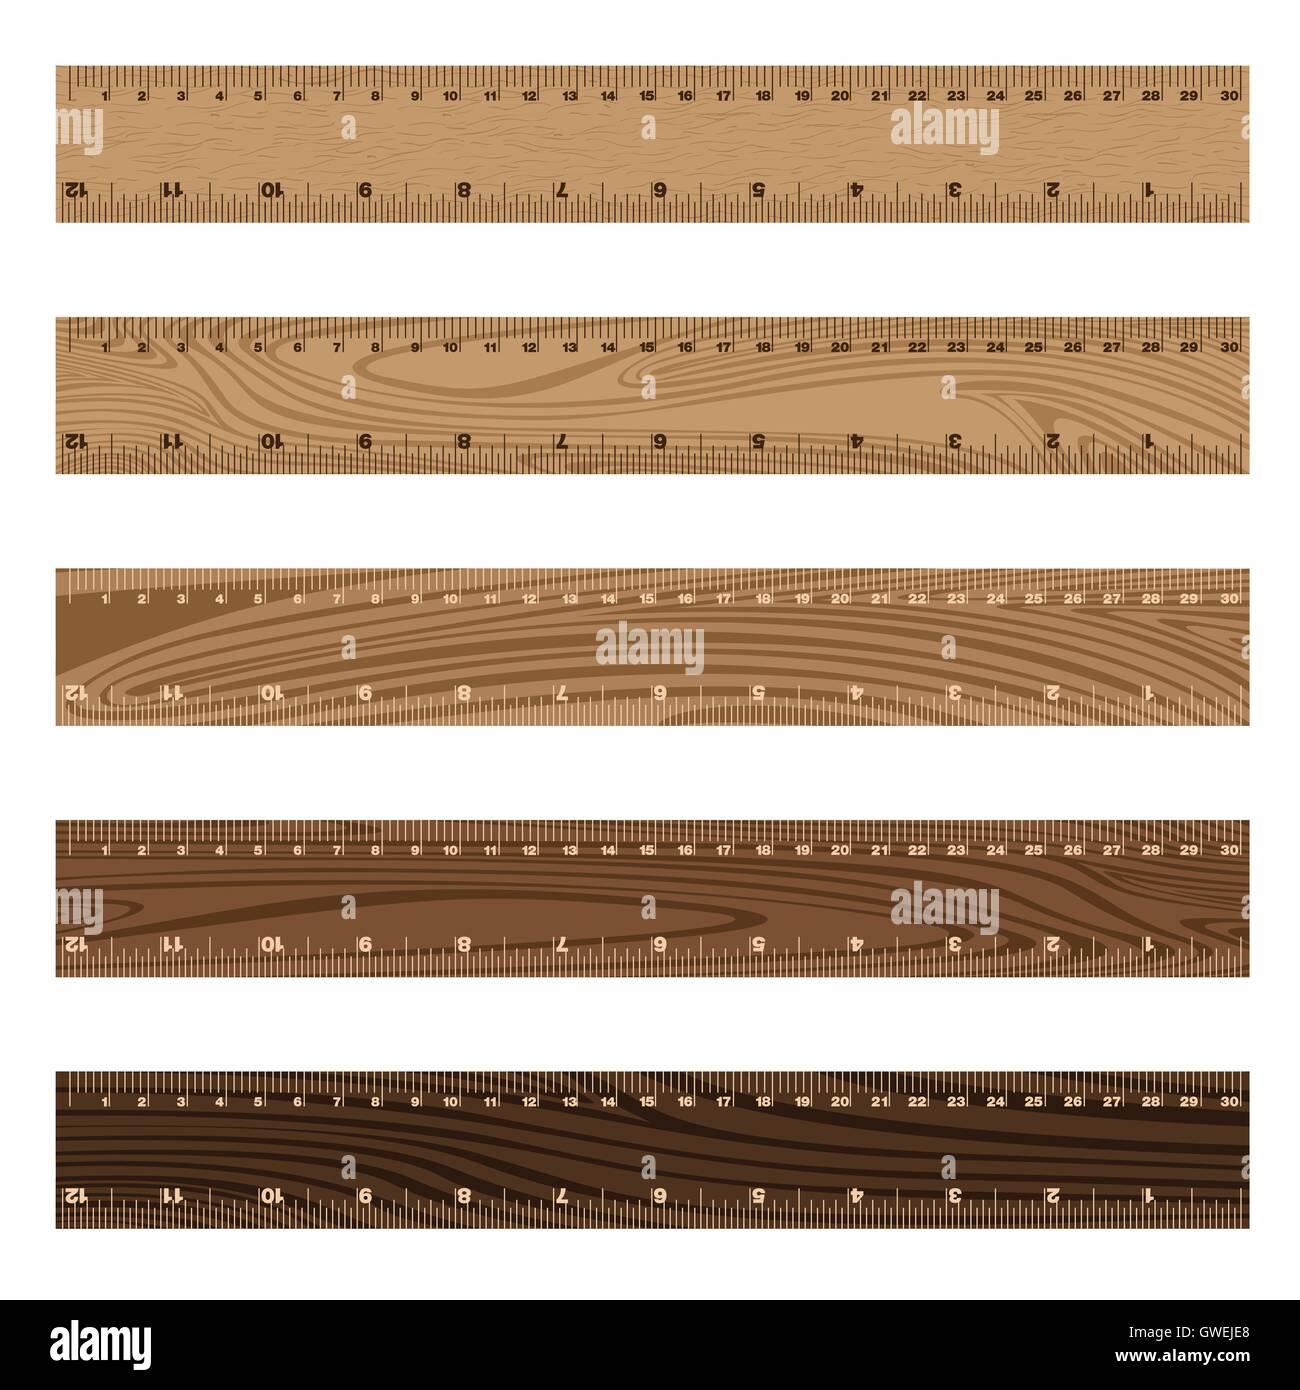 ruler, vector, color, illustration, set, white, office, design, background, art, colorful, wood, object, school, - Stock Image